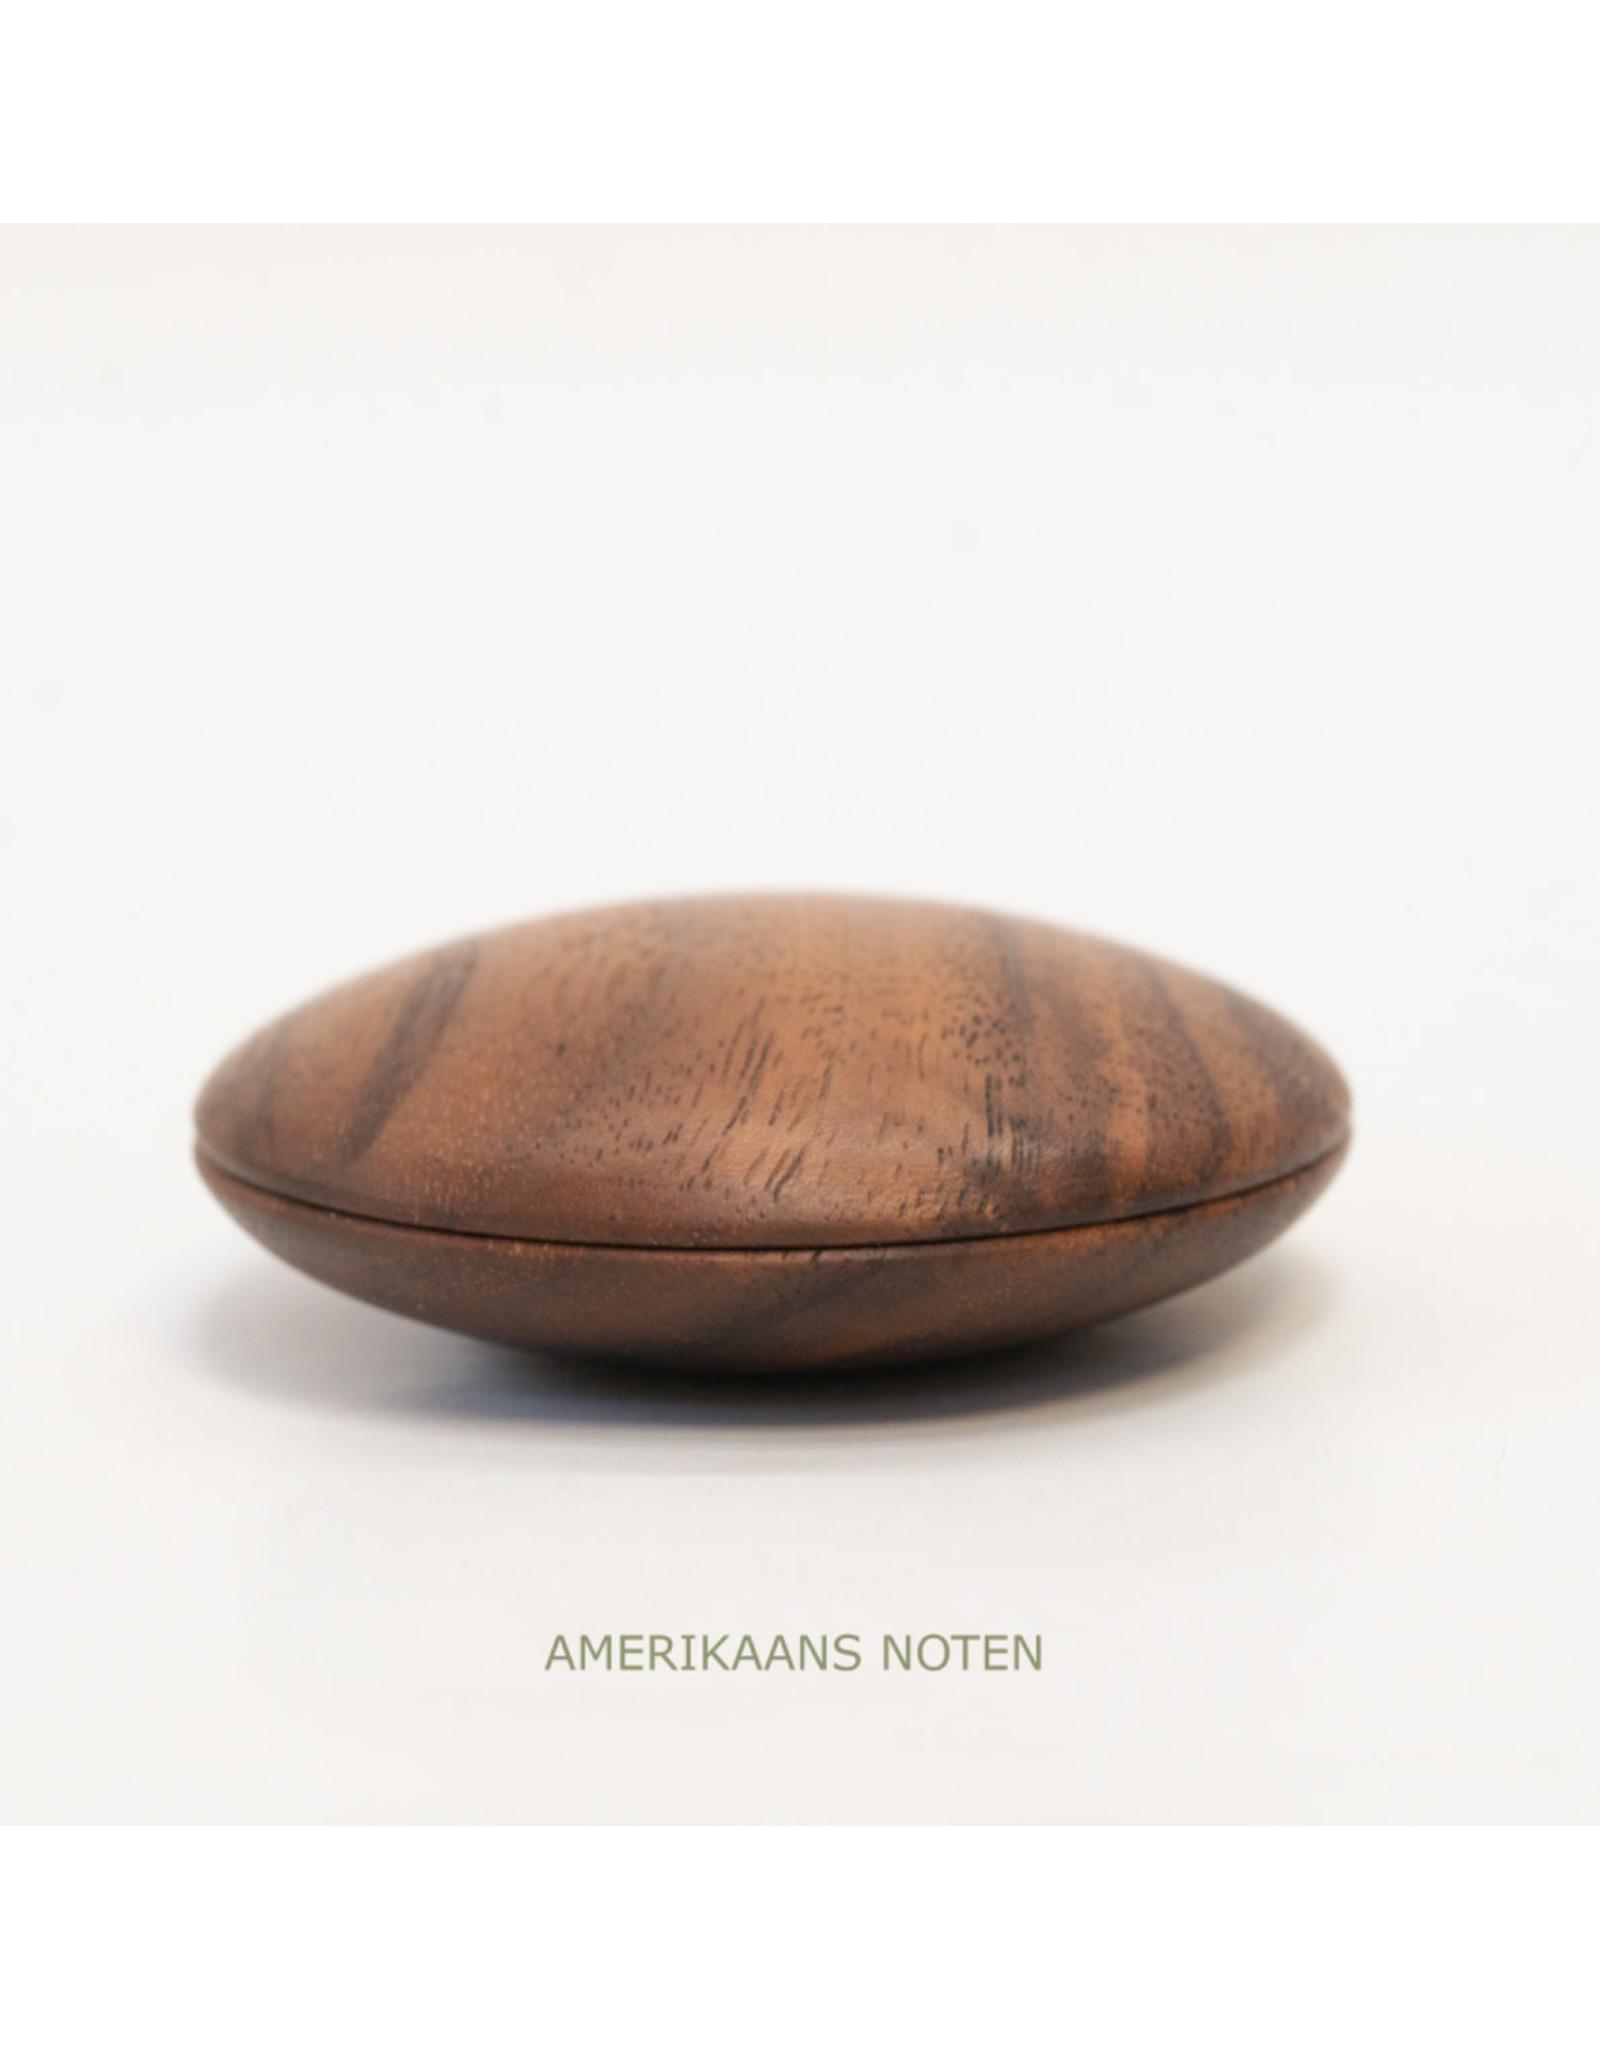 Suzan Doornbos Troosthout | Amerikaans Notenhout | 6 x 6 x 3 cm